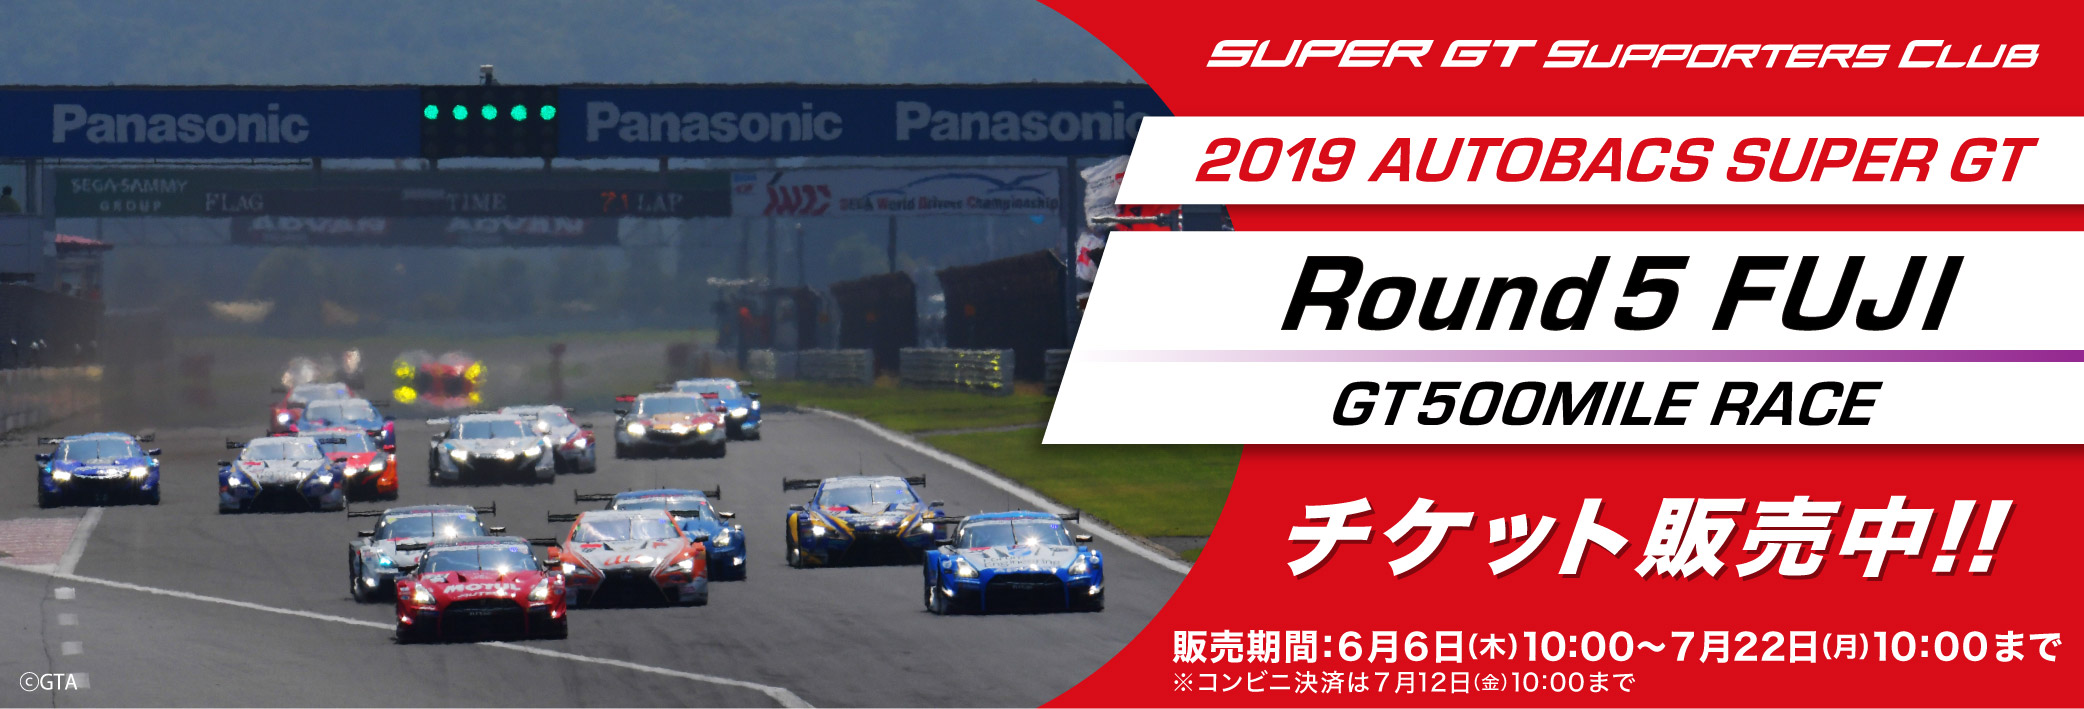 2019 AUTOBACS SUPER GT Rd.5 FUJI GT 500MILE RACE チケット販売のご案内